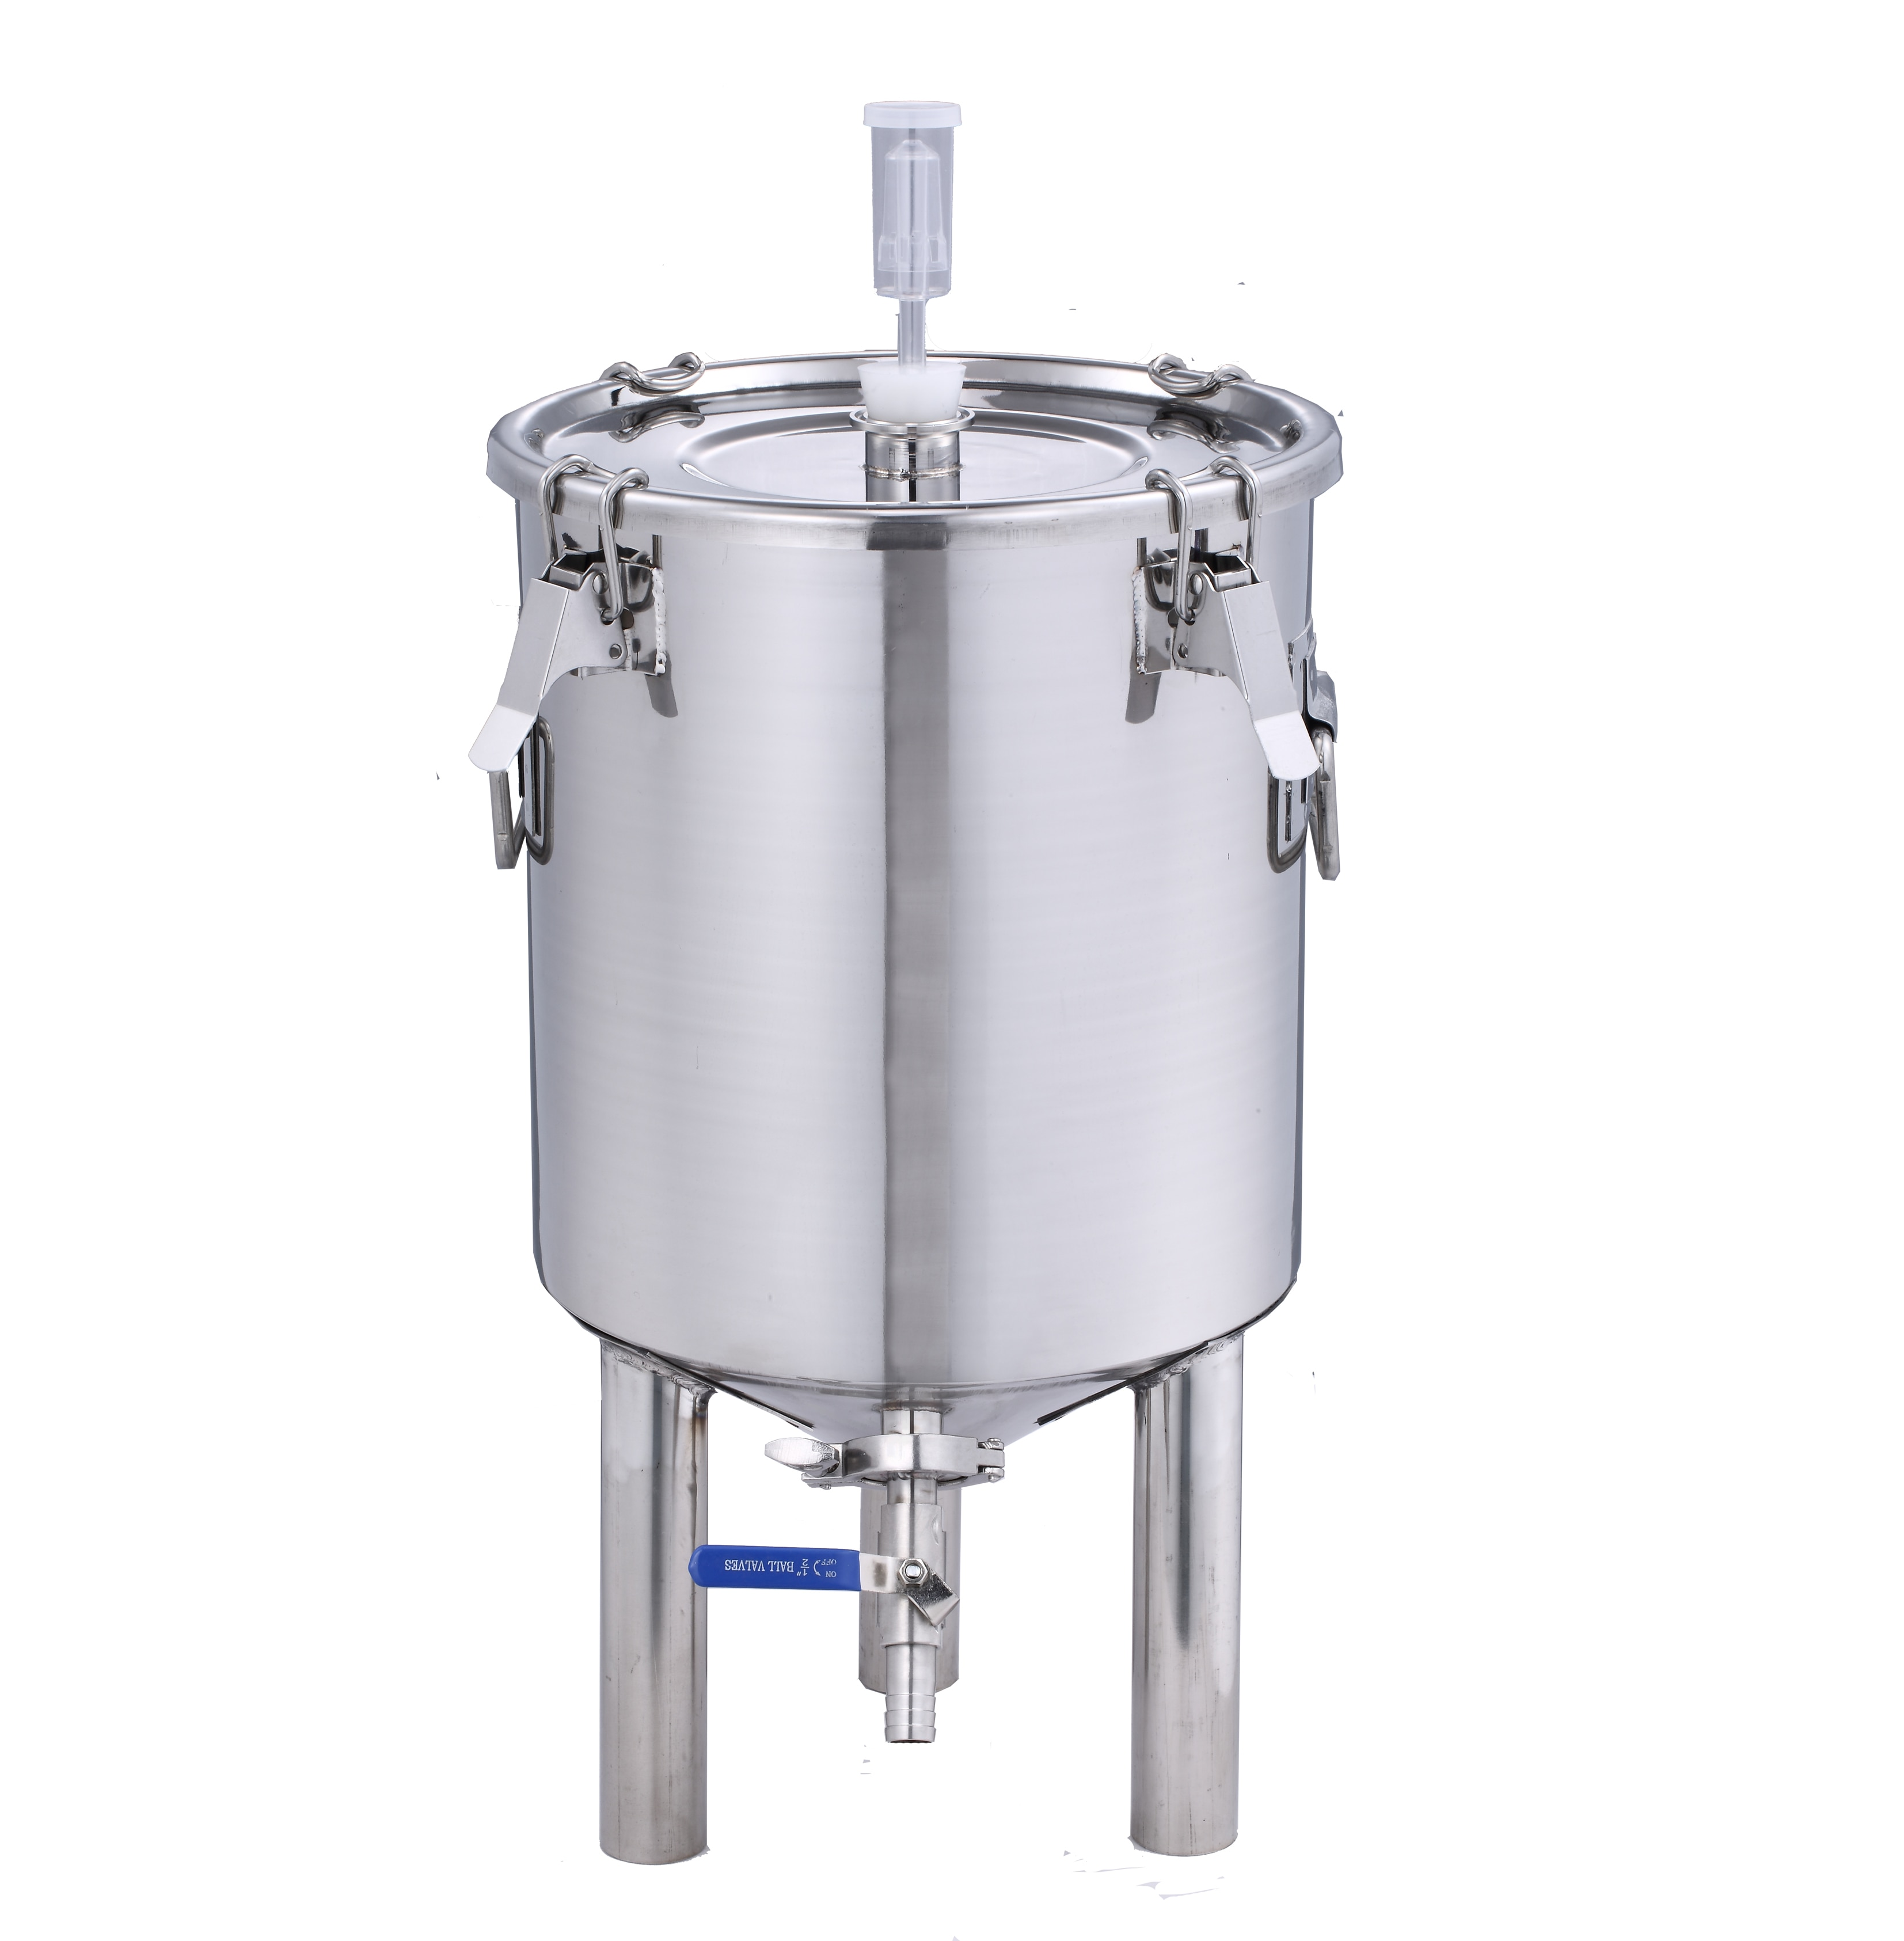 30L الفولاذ المقاوم للصدأ خزان البيرة و النبيذ خزان التخمير المخروطية تخمير 1.5 مللي متر سمك SUS 304 stainlesss الصلب Fementer